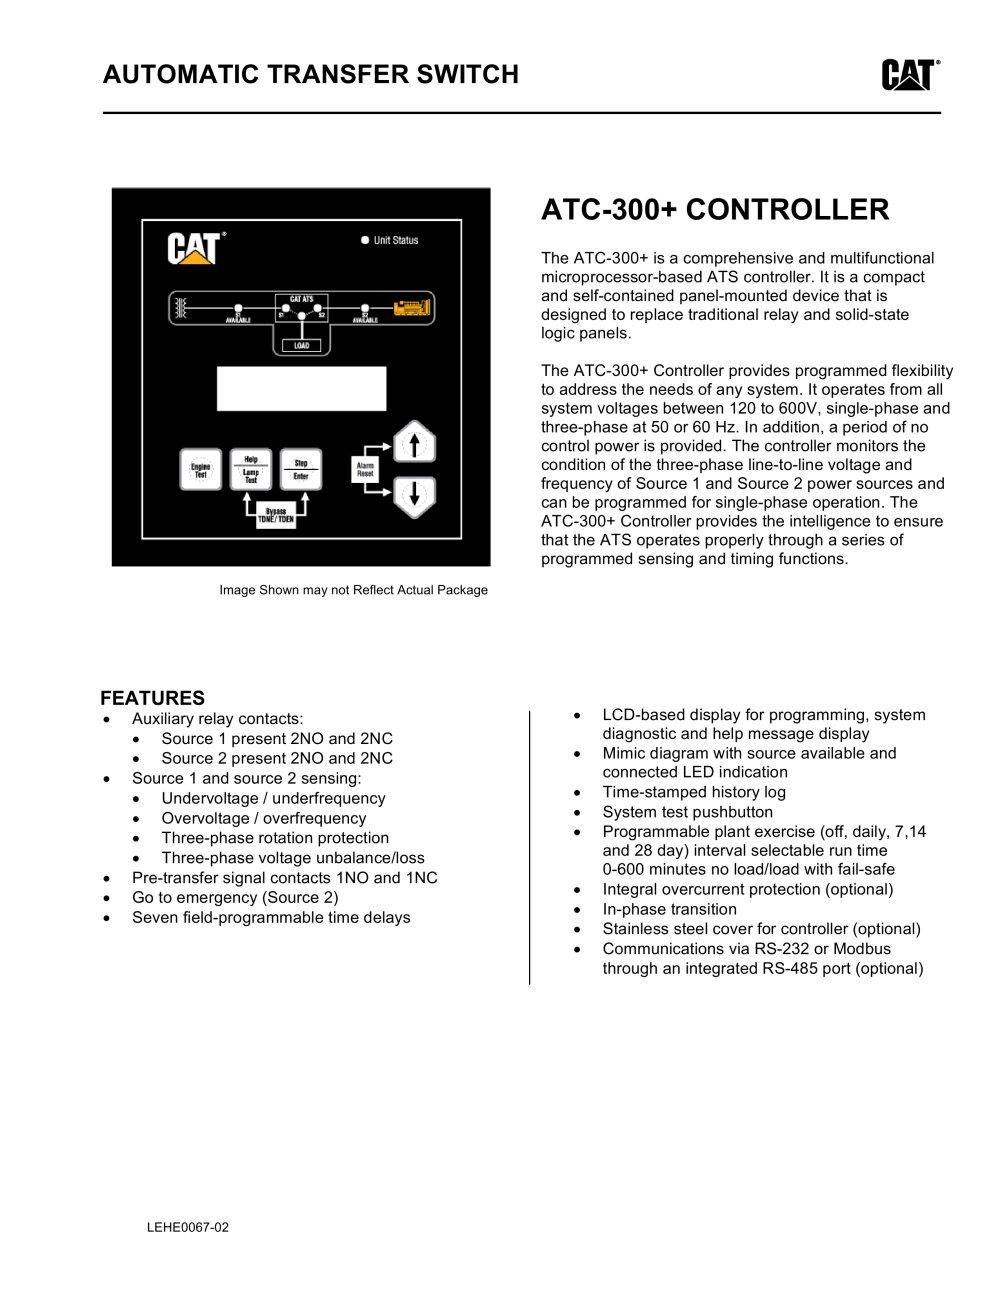 atc 300 controller caterpillar electric power pdf catalogue rh pdf directindustry com